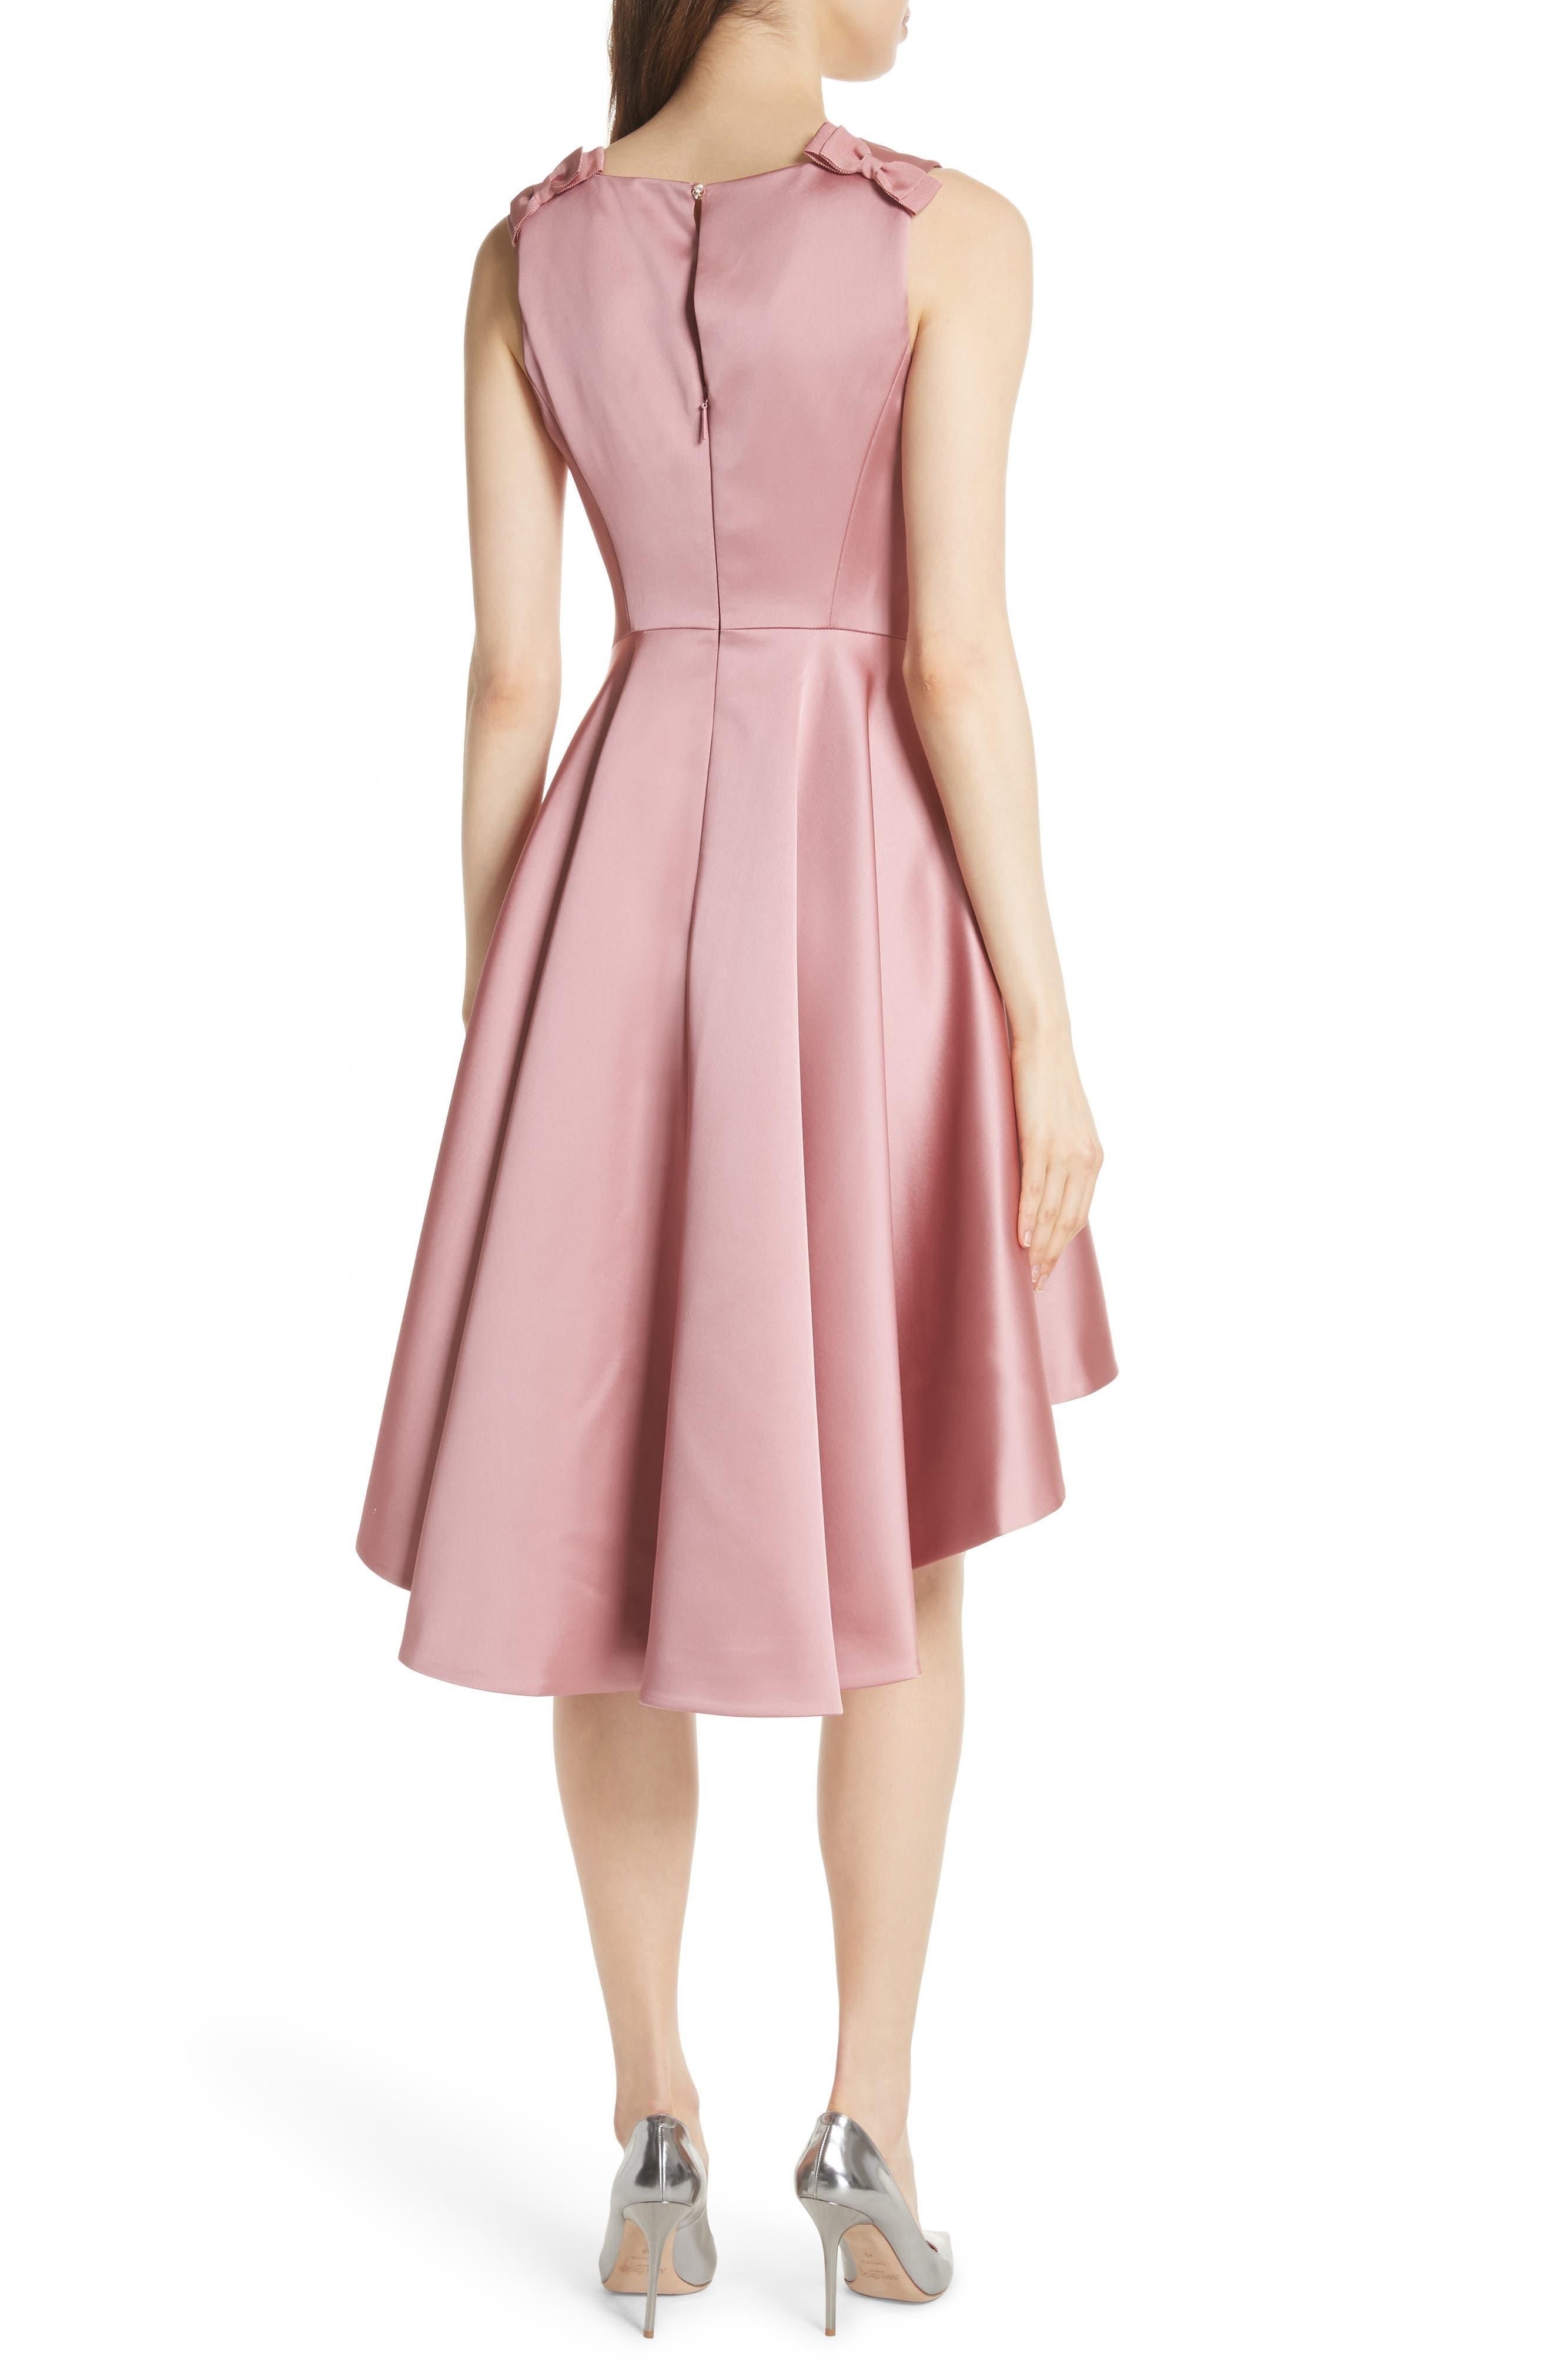 Rhubi High/Low Dress,                             Alternate thumbnail 2, color,                             Pink